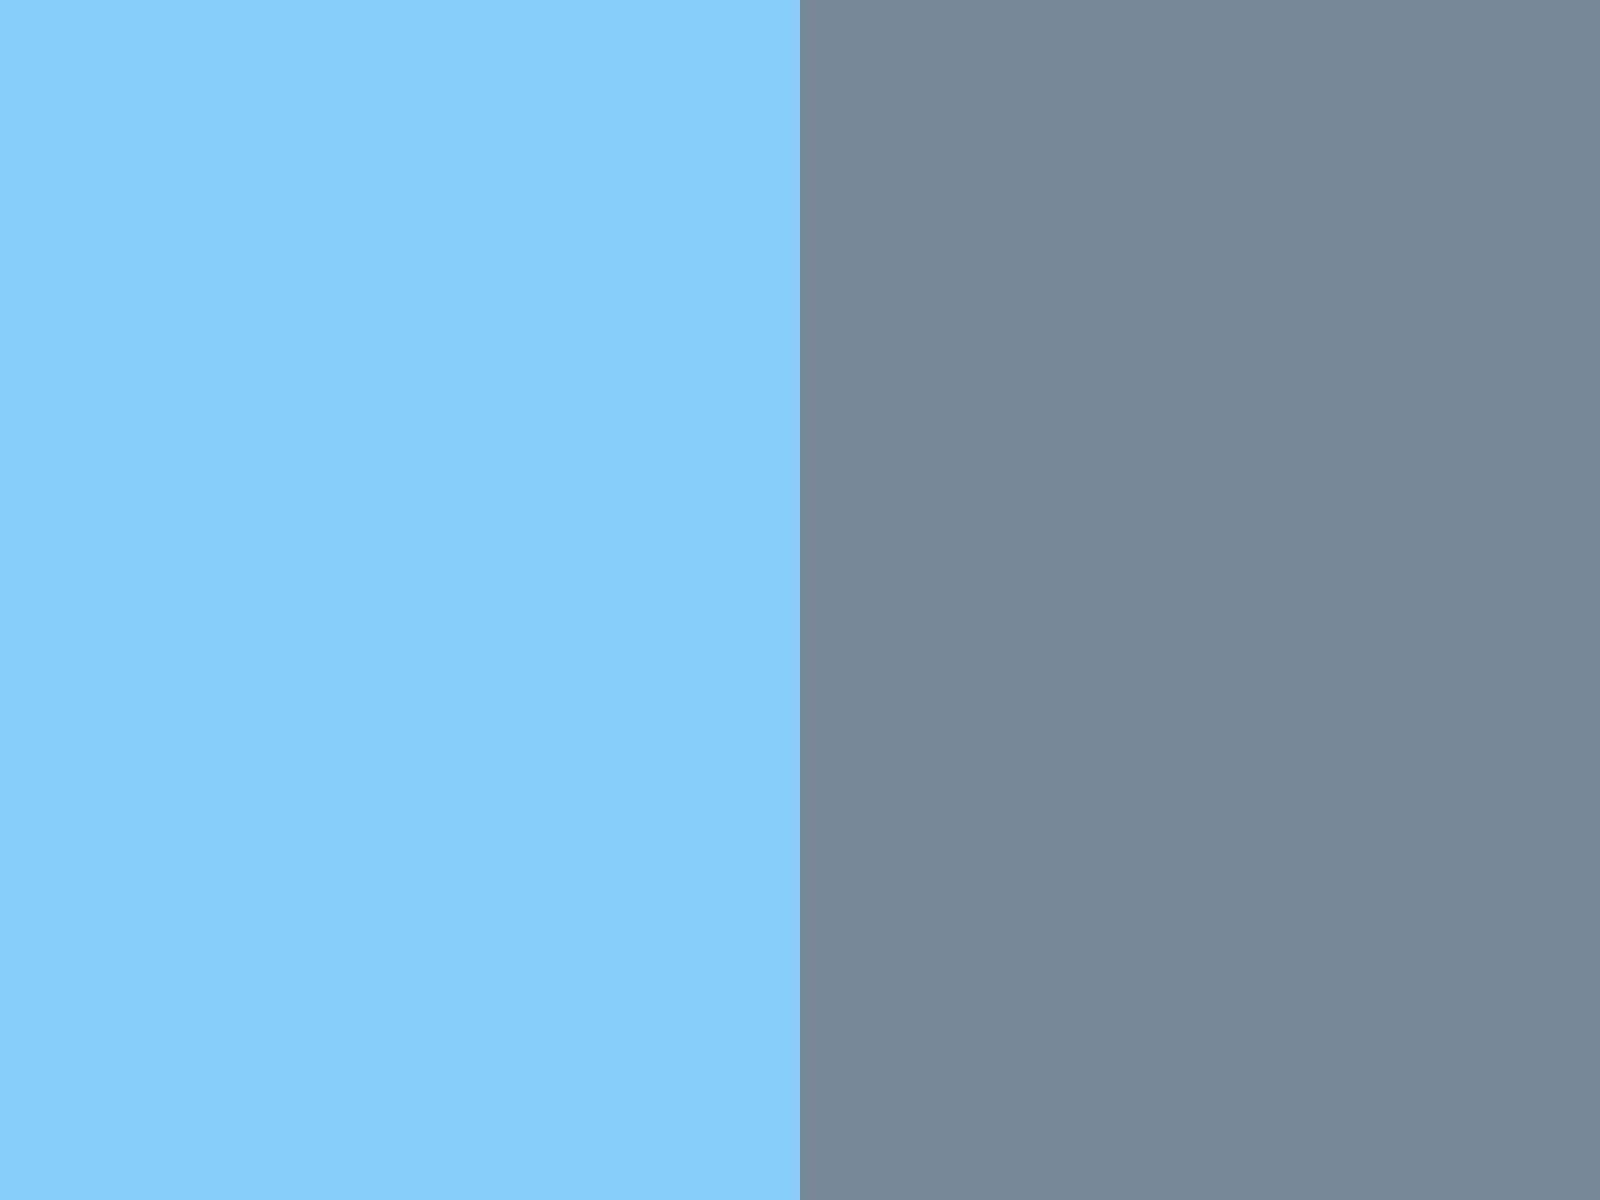 1600x1200 light sky blue and light slate gray two color background - Light Sky Blue Color